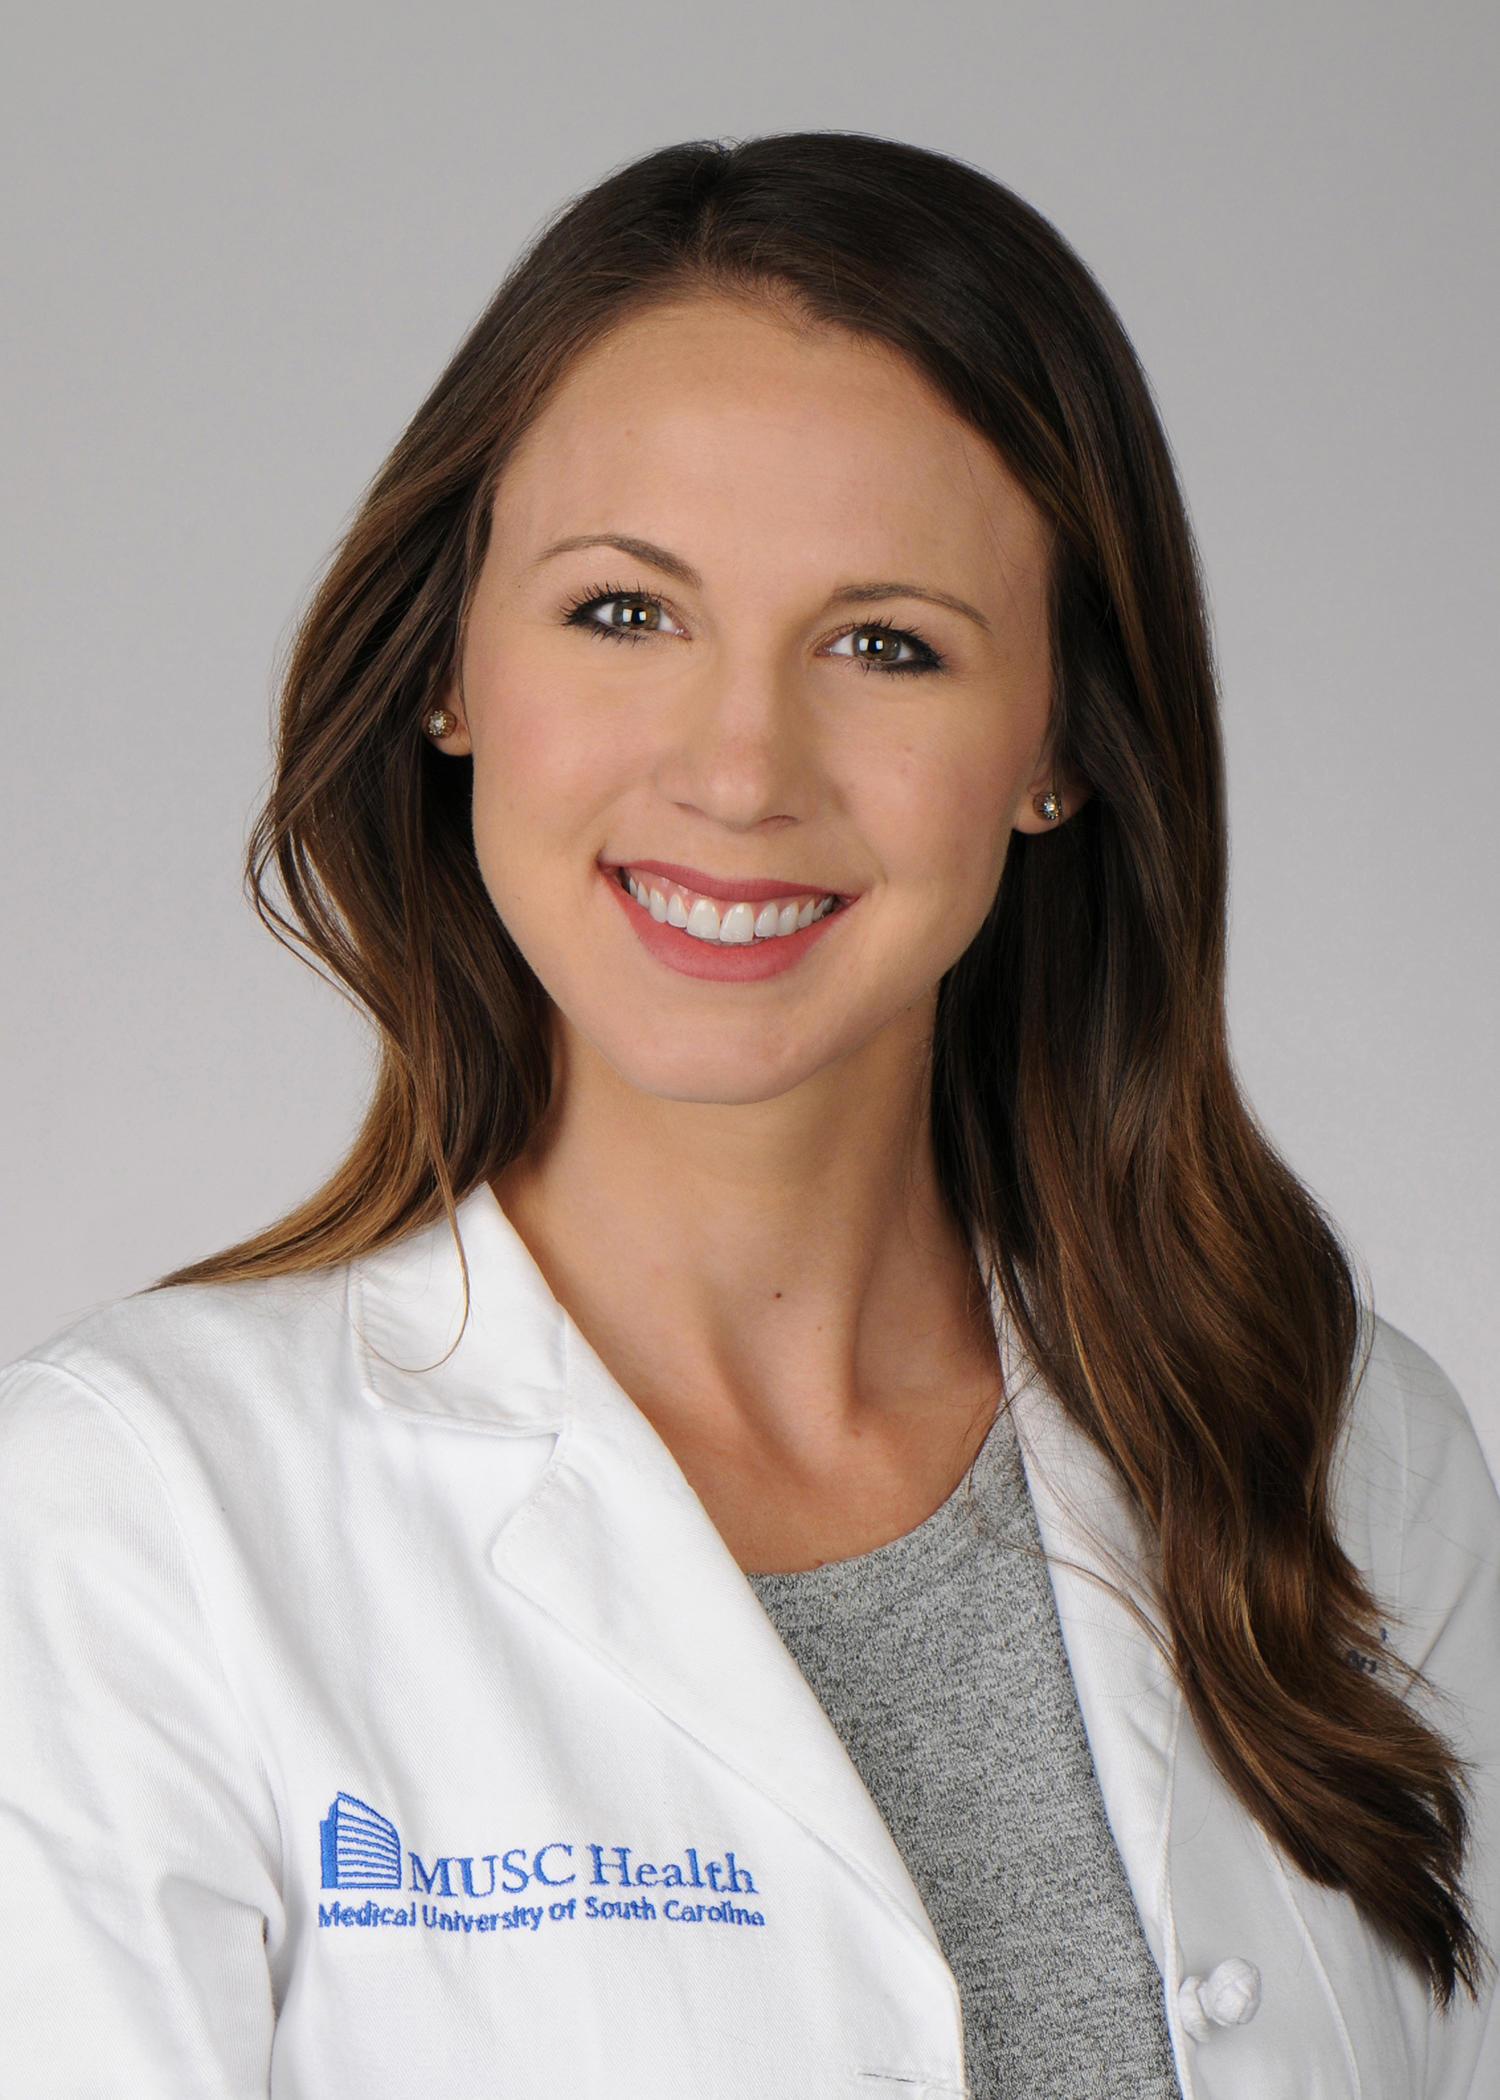 Brittany Lueking MD